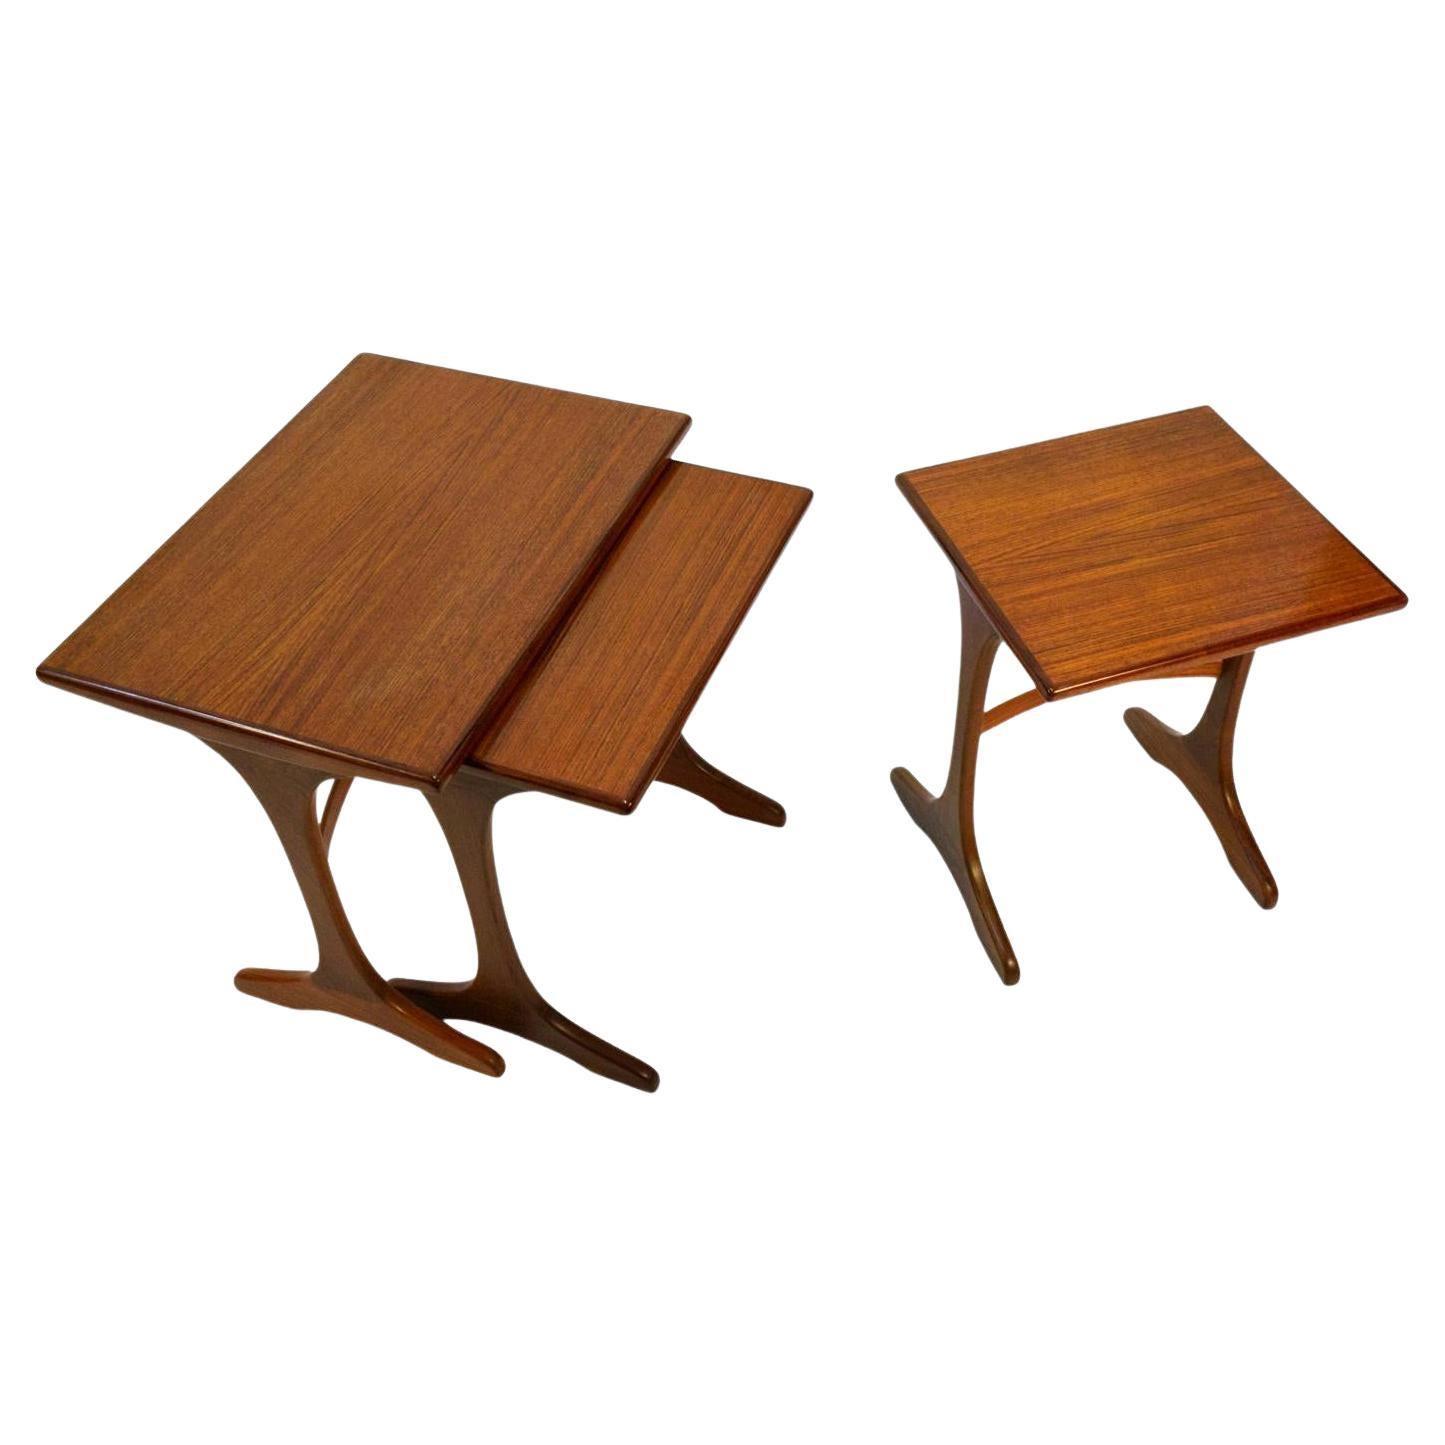 Early Mid-Century Scandinavian Modern Teak G Plan Nesting Tables Set